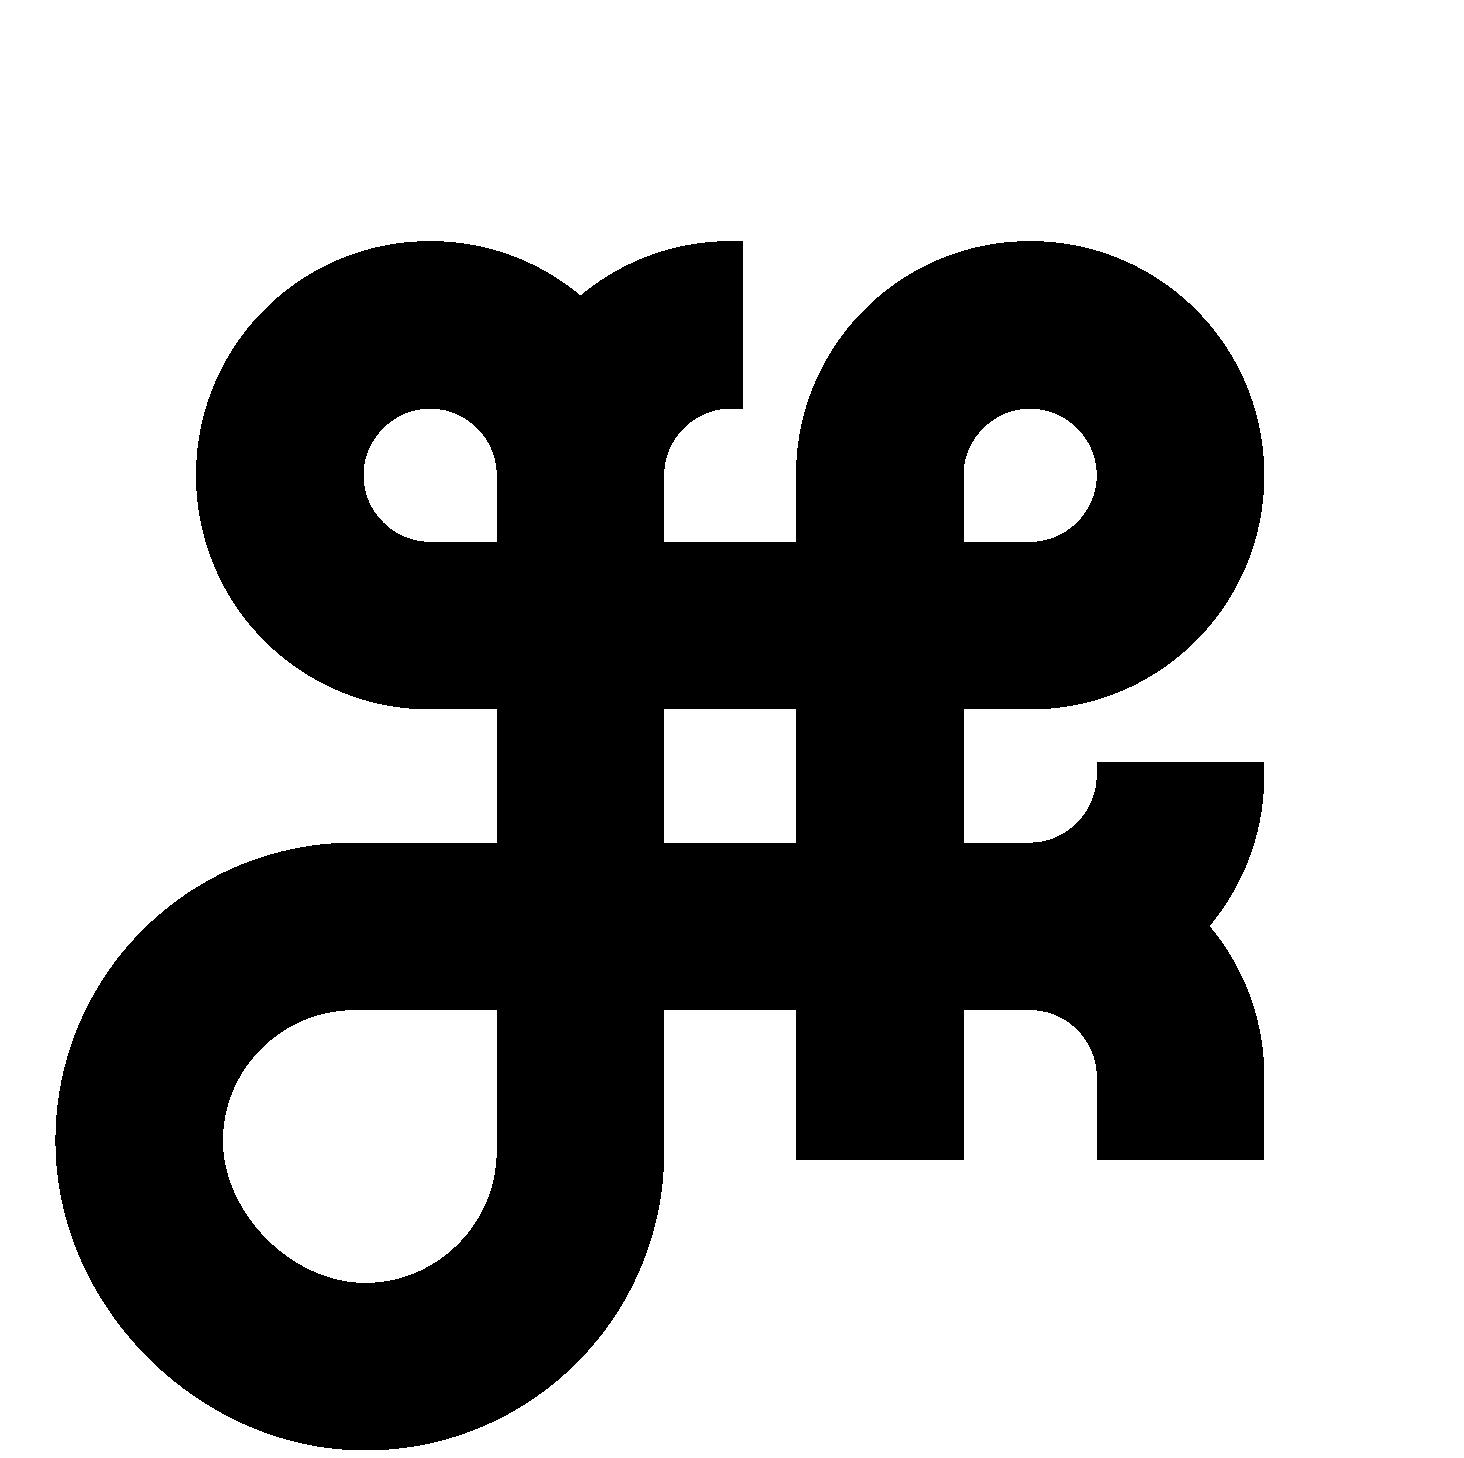 gustavkarlsson.com